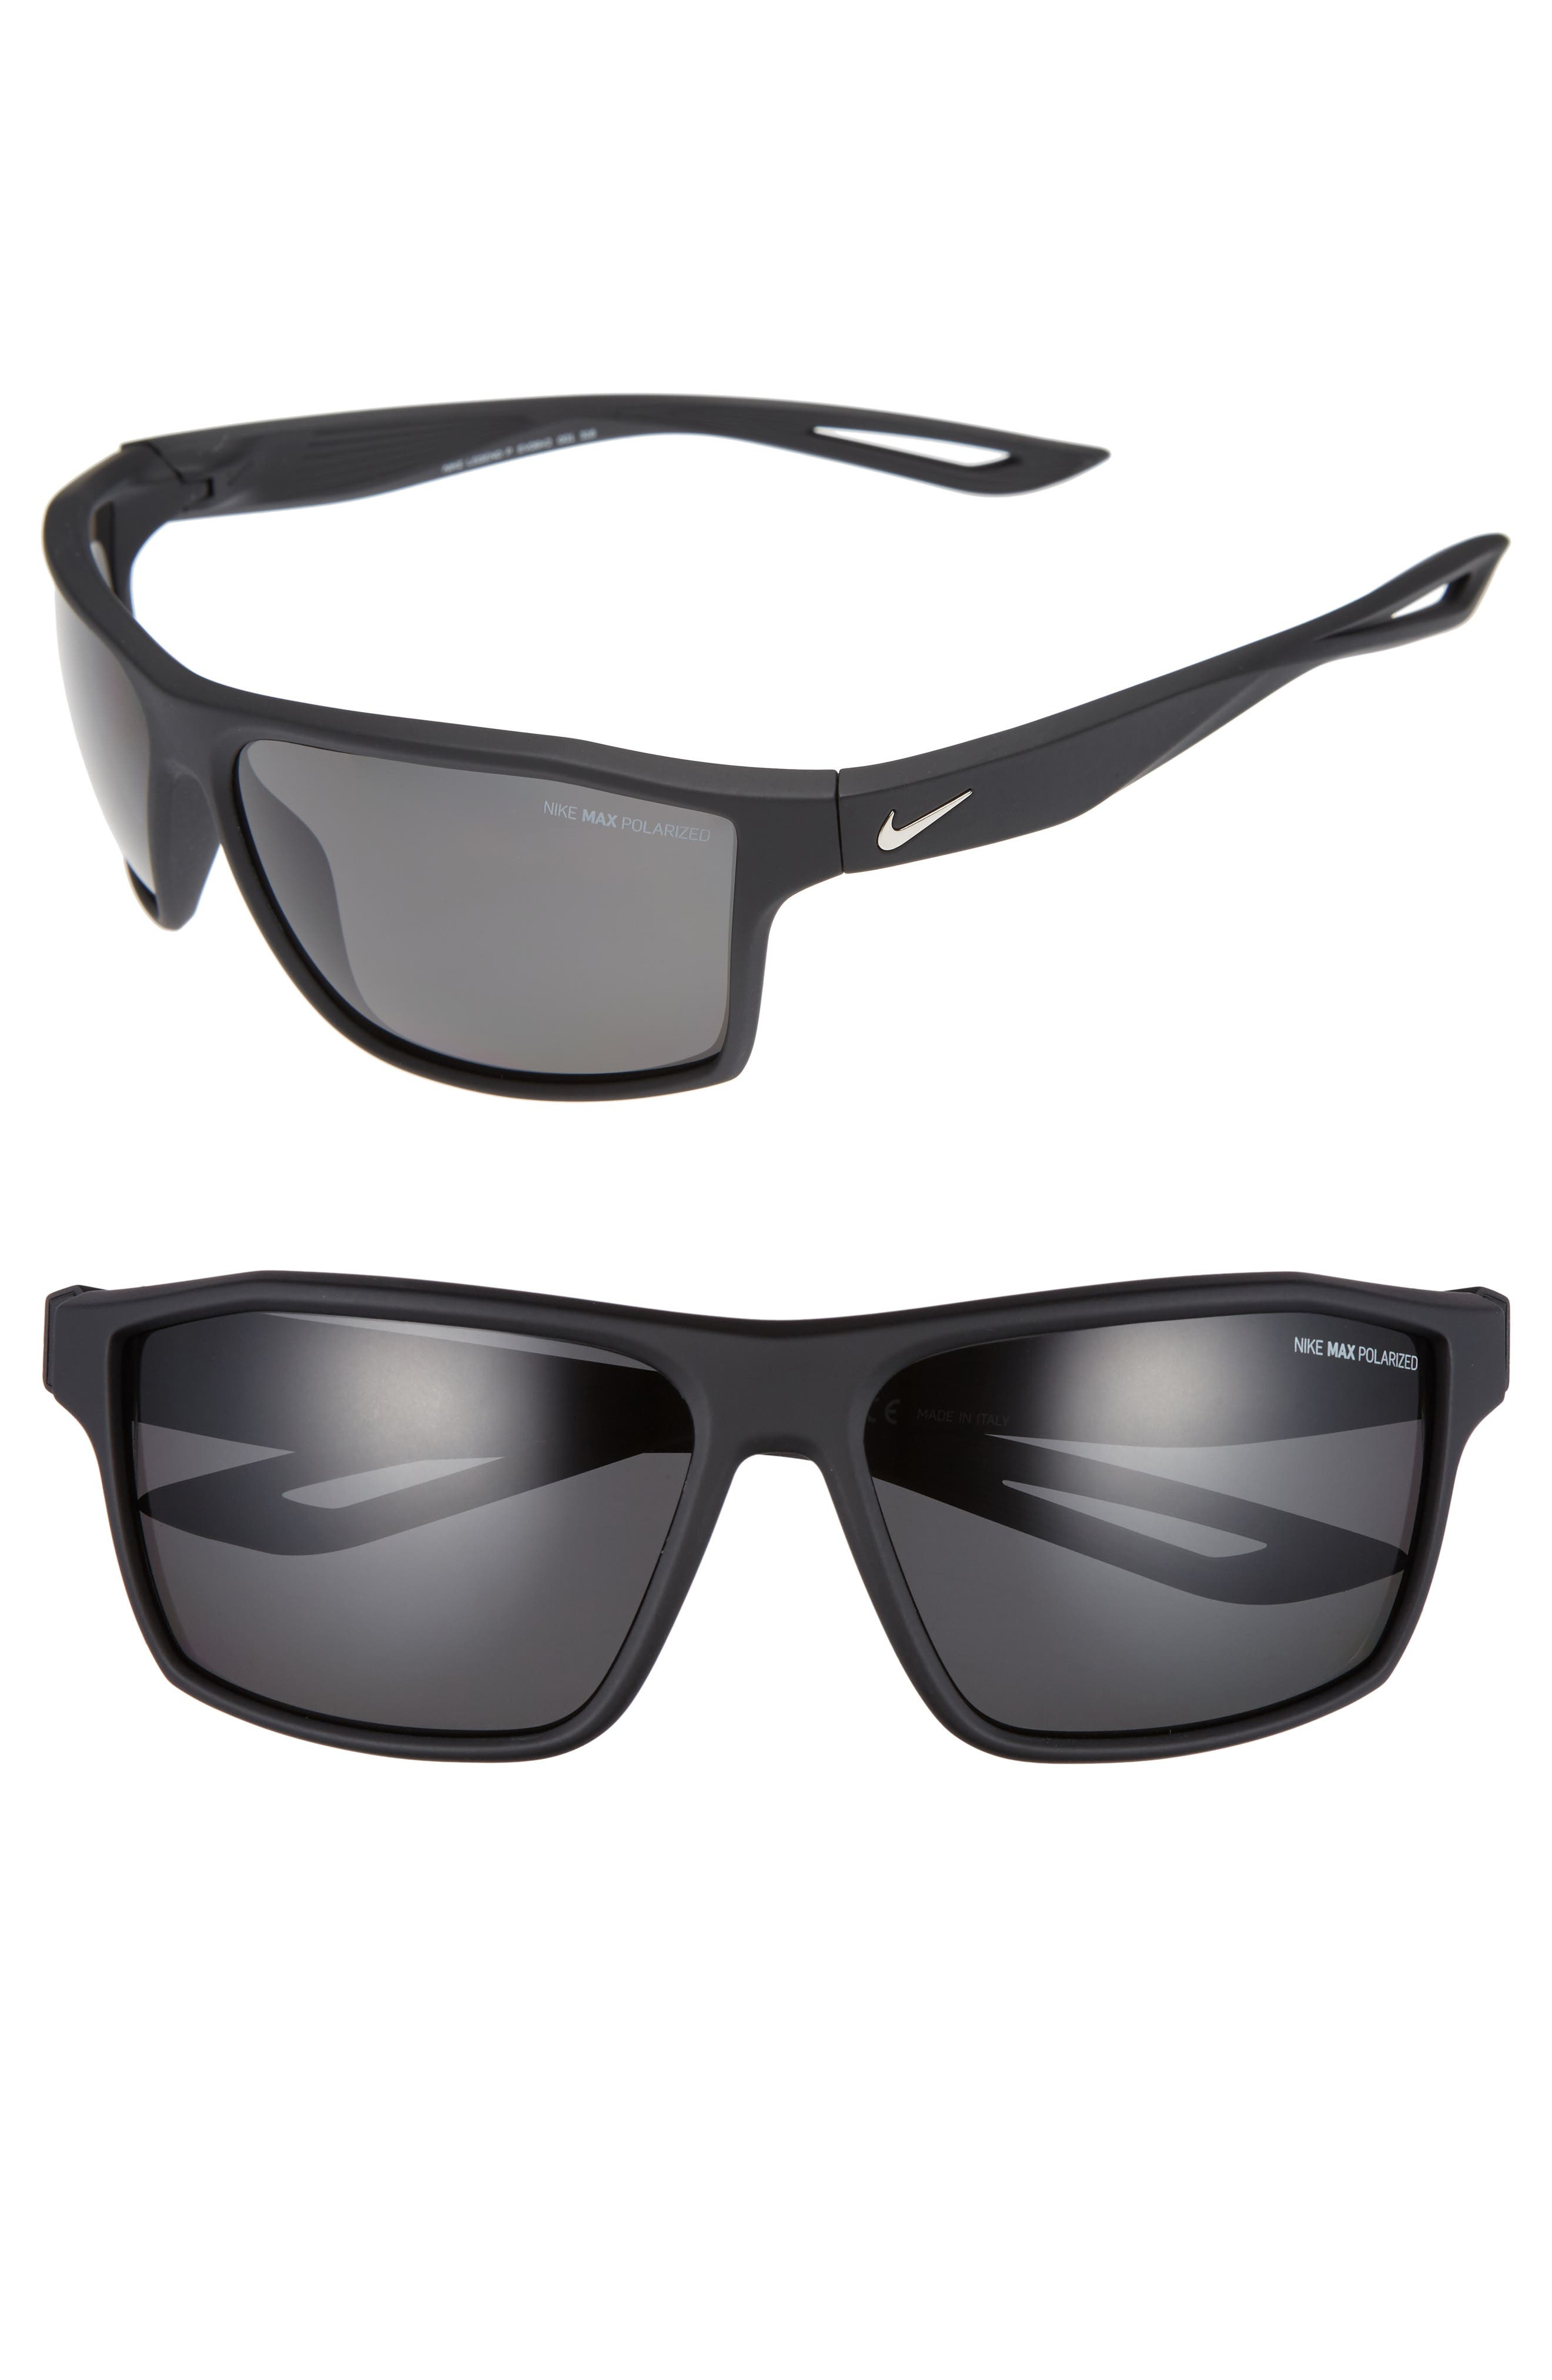 Nike Legend 65mm Polarized Multi-Sport Sunglasses